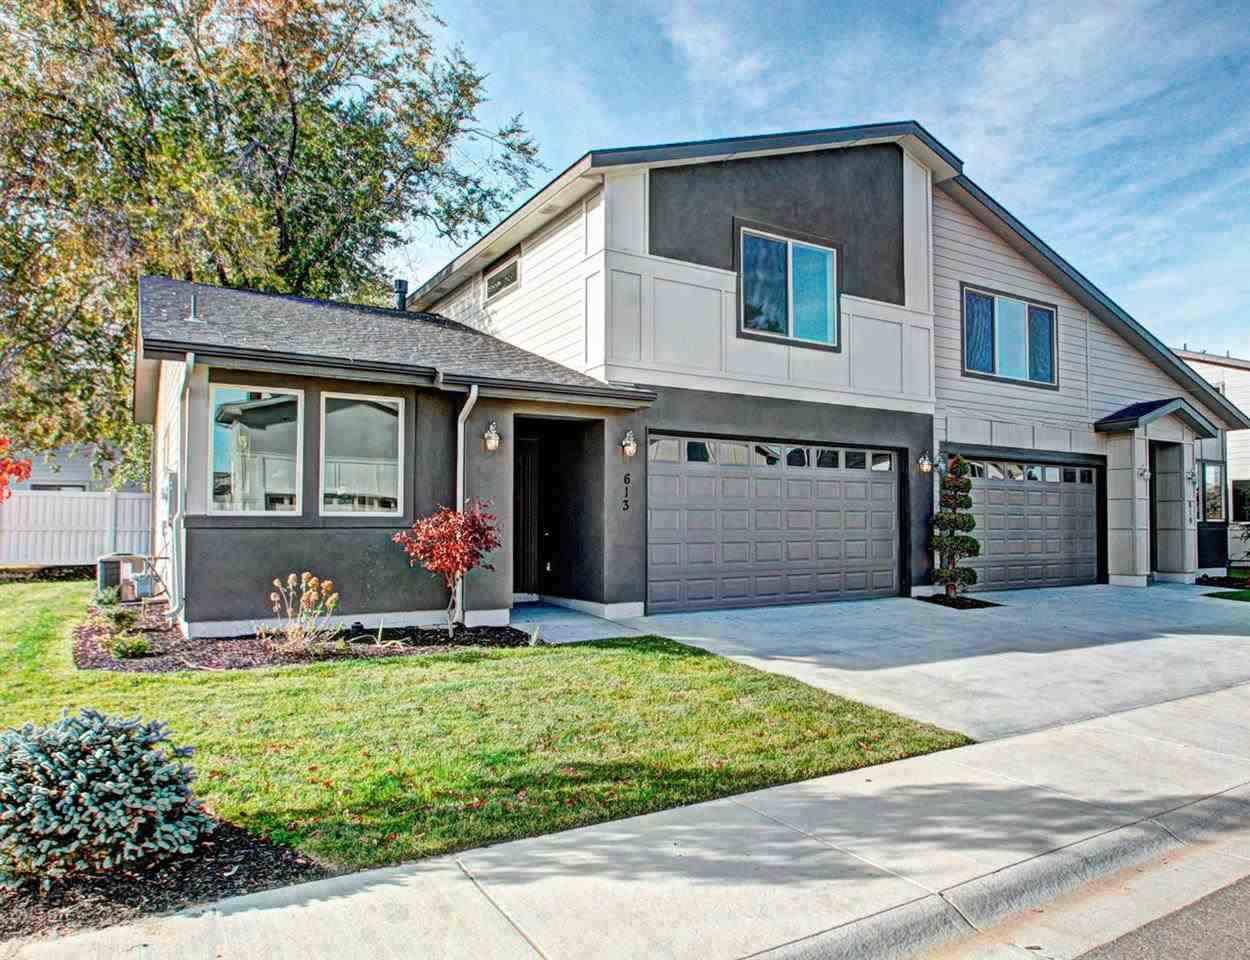 Townhouse for Sale at 548 Escalade, Nampa 548 N Escalade Pl Nampa, Idaho, 83651 United States